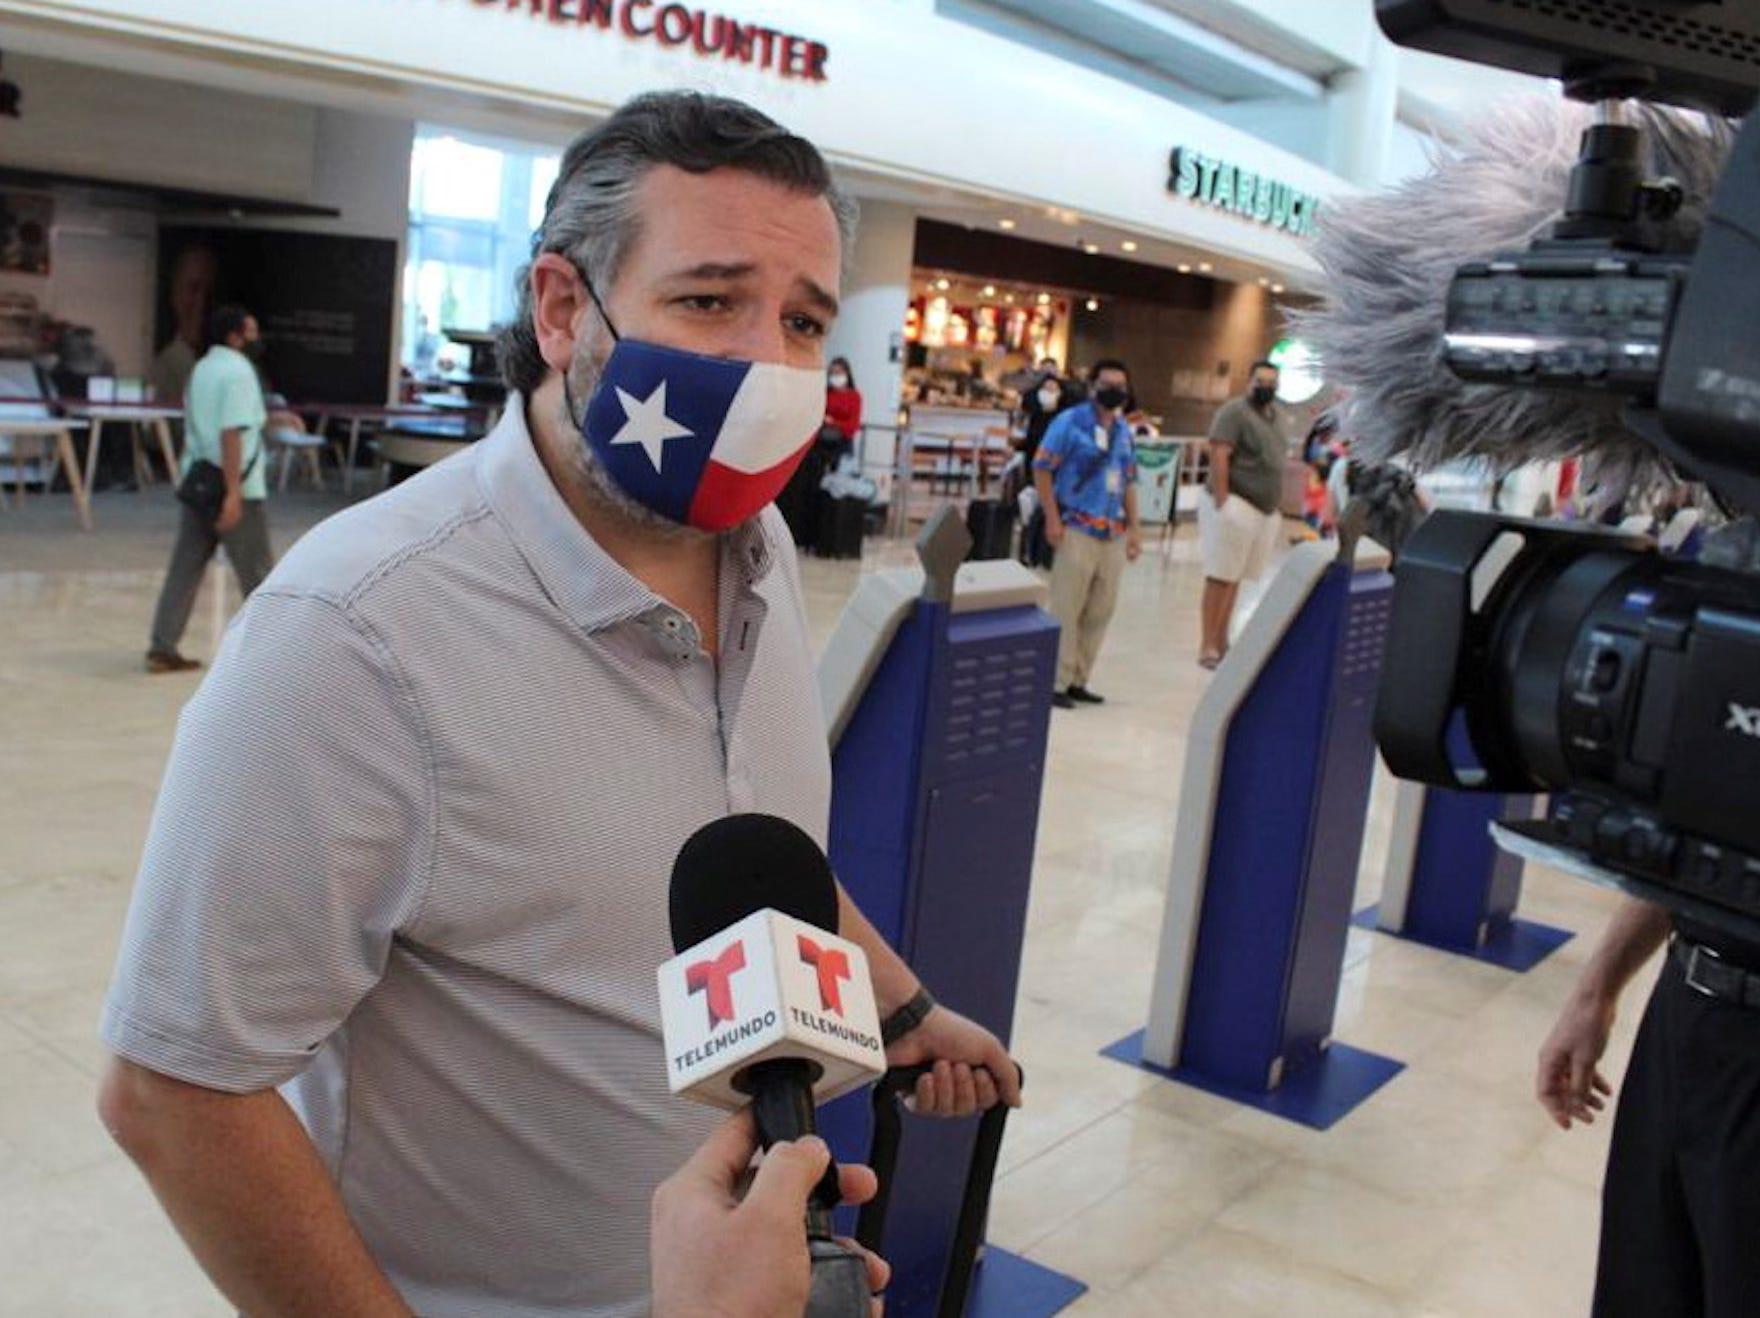 Ted Cruz cancun 3.JPG